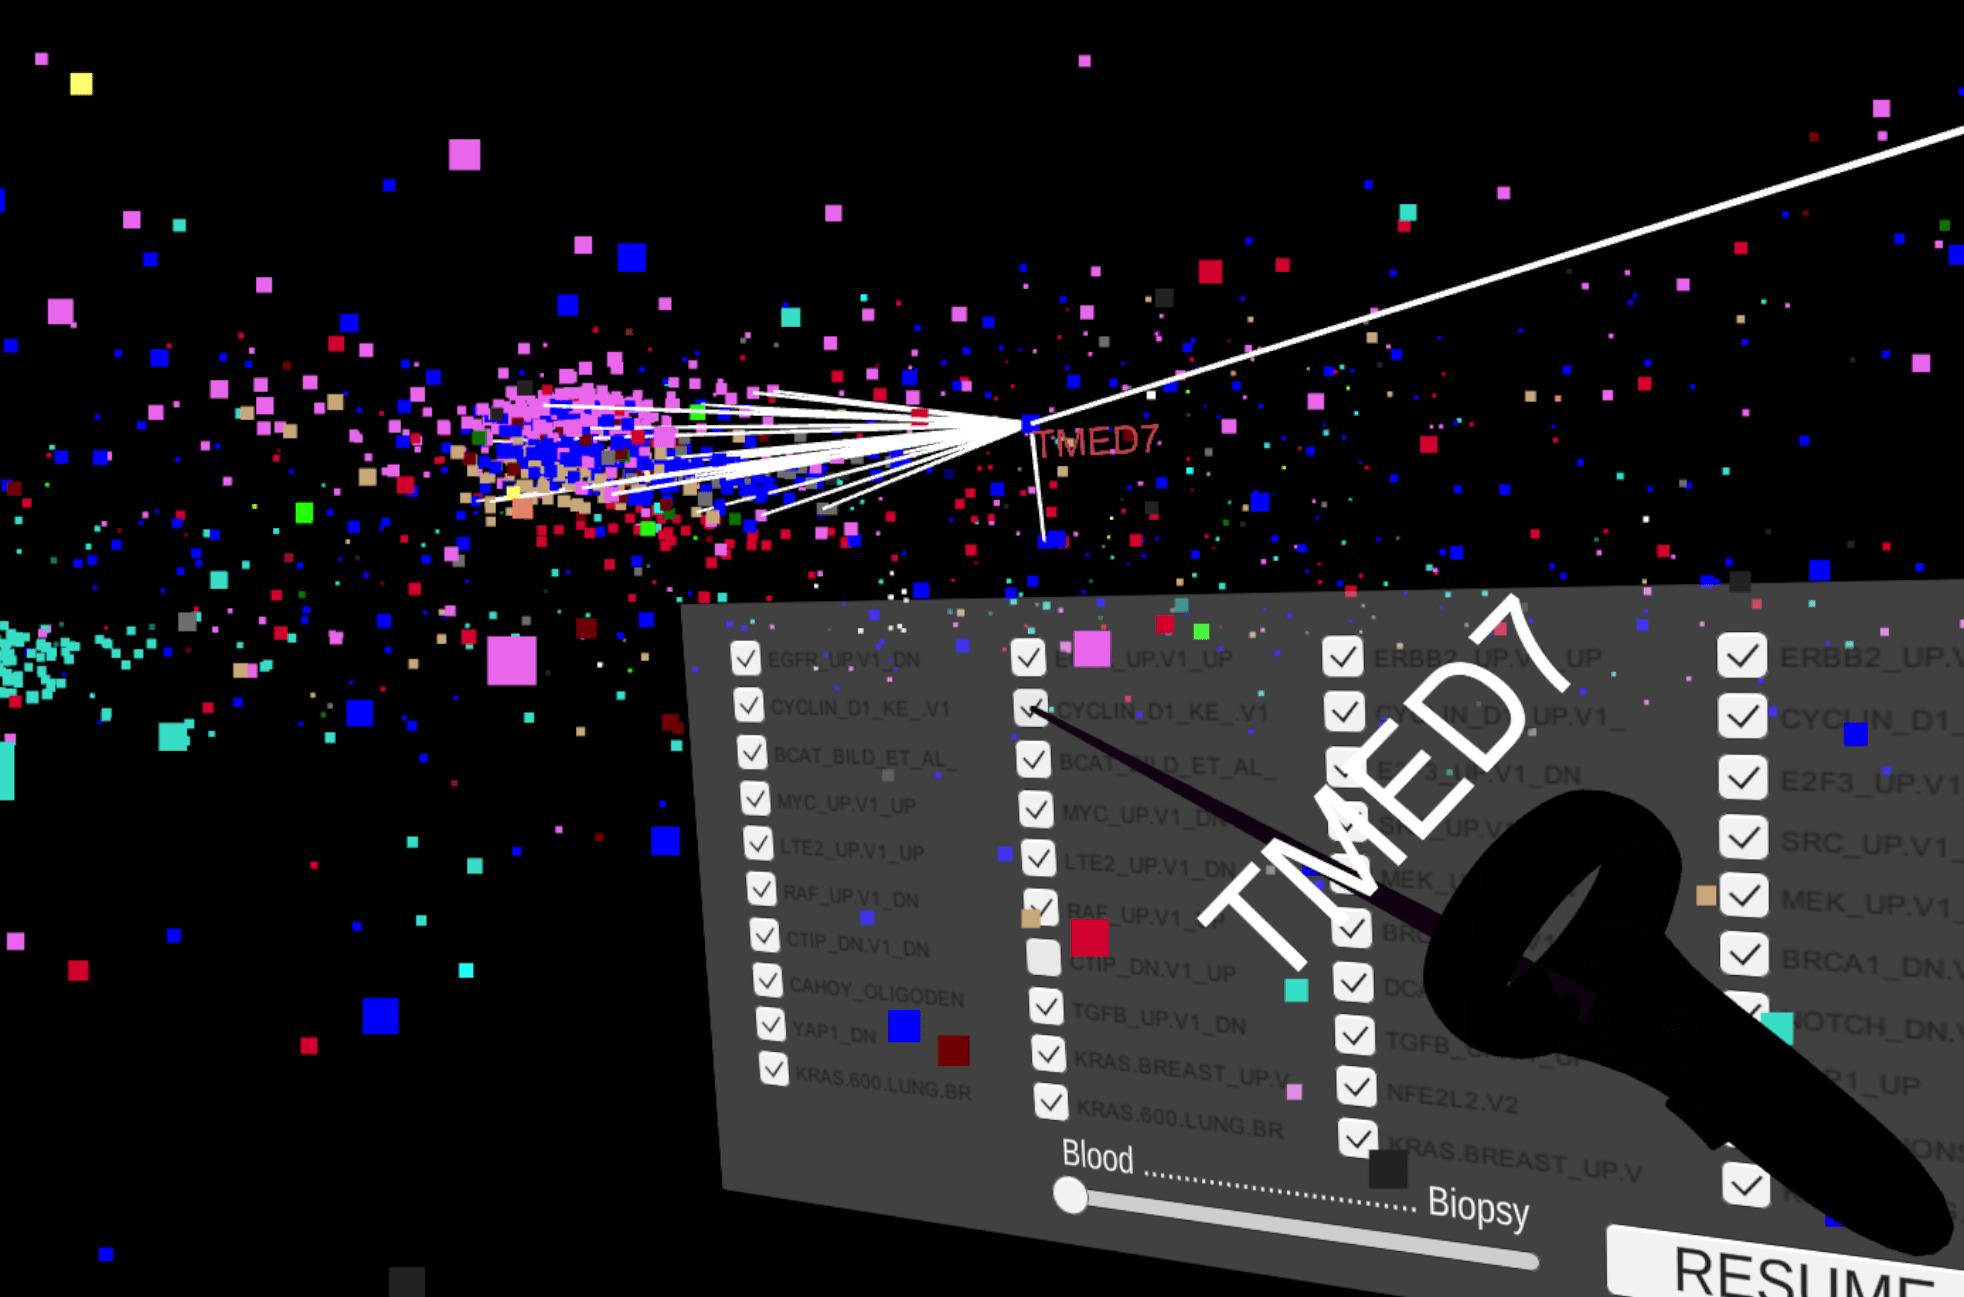 Screenshot from GeneNet VR